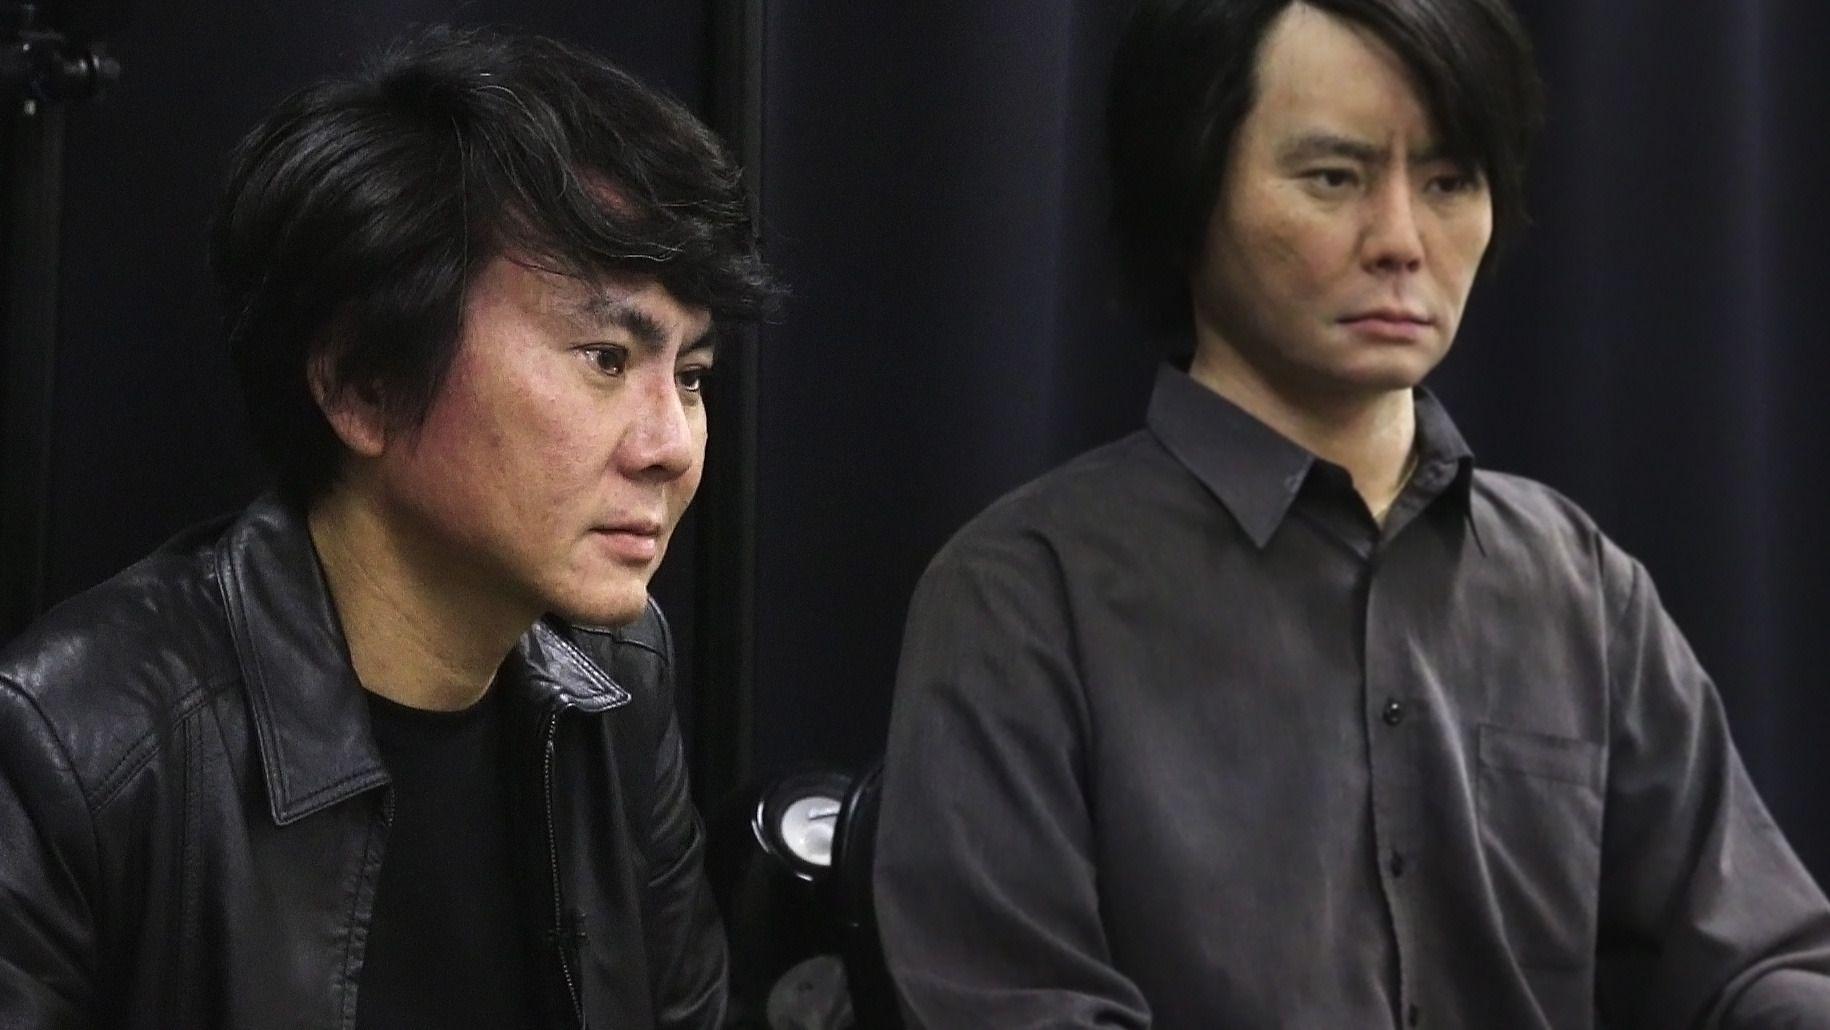 Professor Hiroshi Ishiguro og hans Geminoid.Foto: Hardware.no